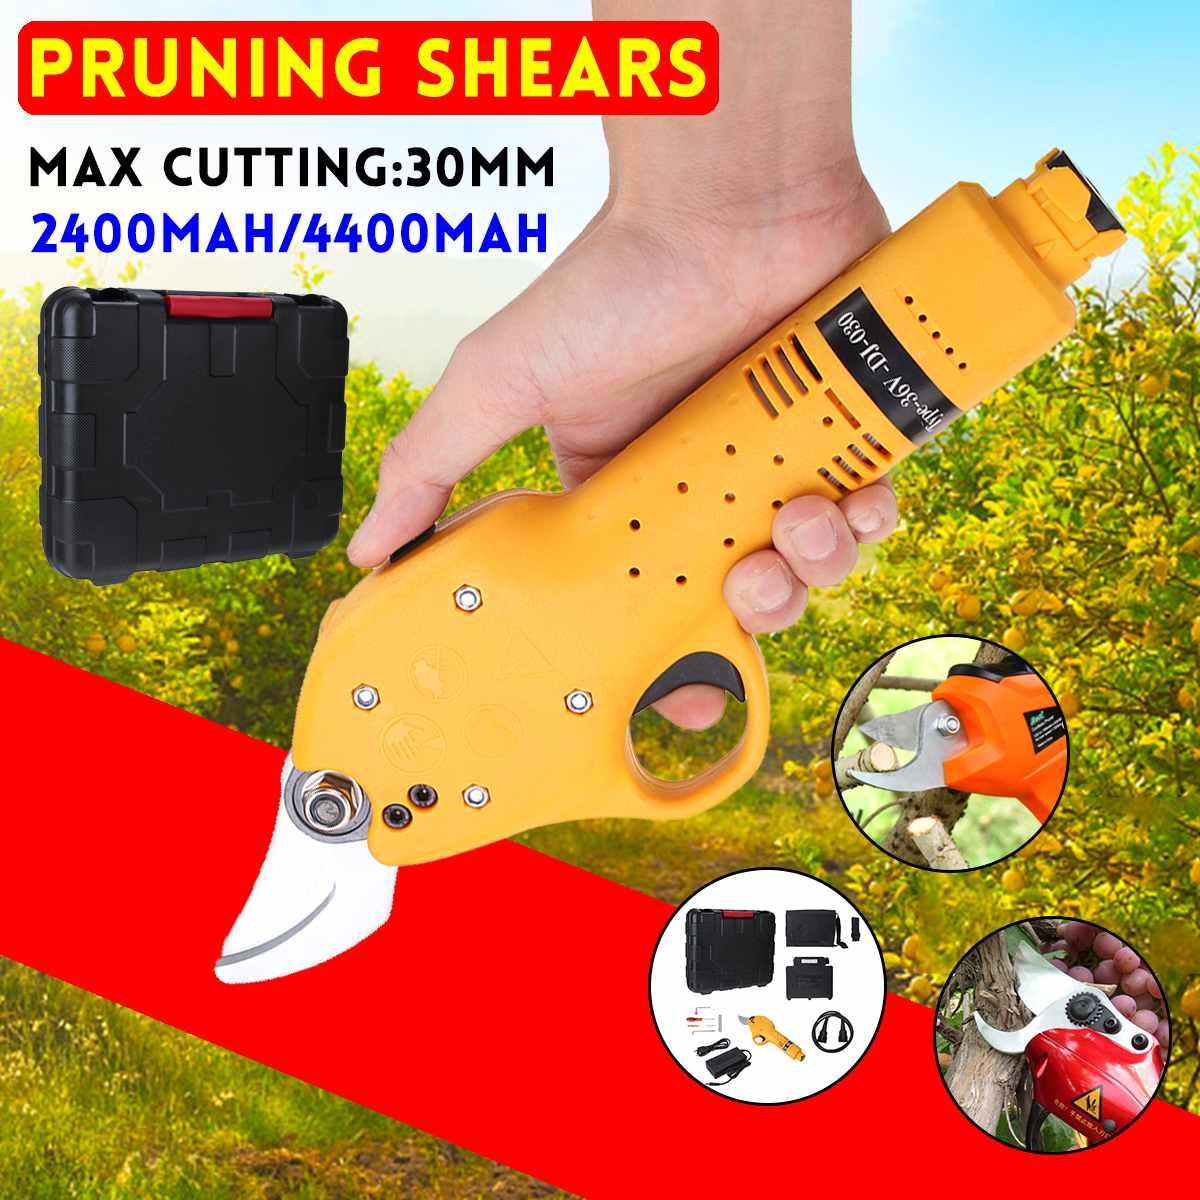 36V Electric Pruning Scissors Cordless Pruning Shears Garden Pruner Secateur Branch Cutting Tool 2400mAh/4400mAh Lithium Battery